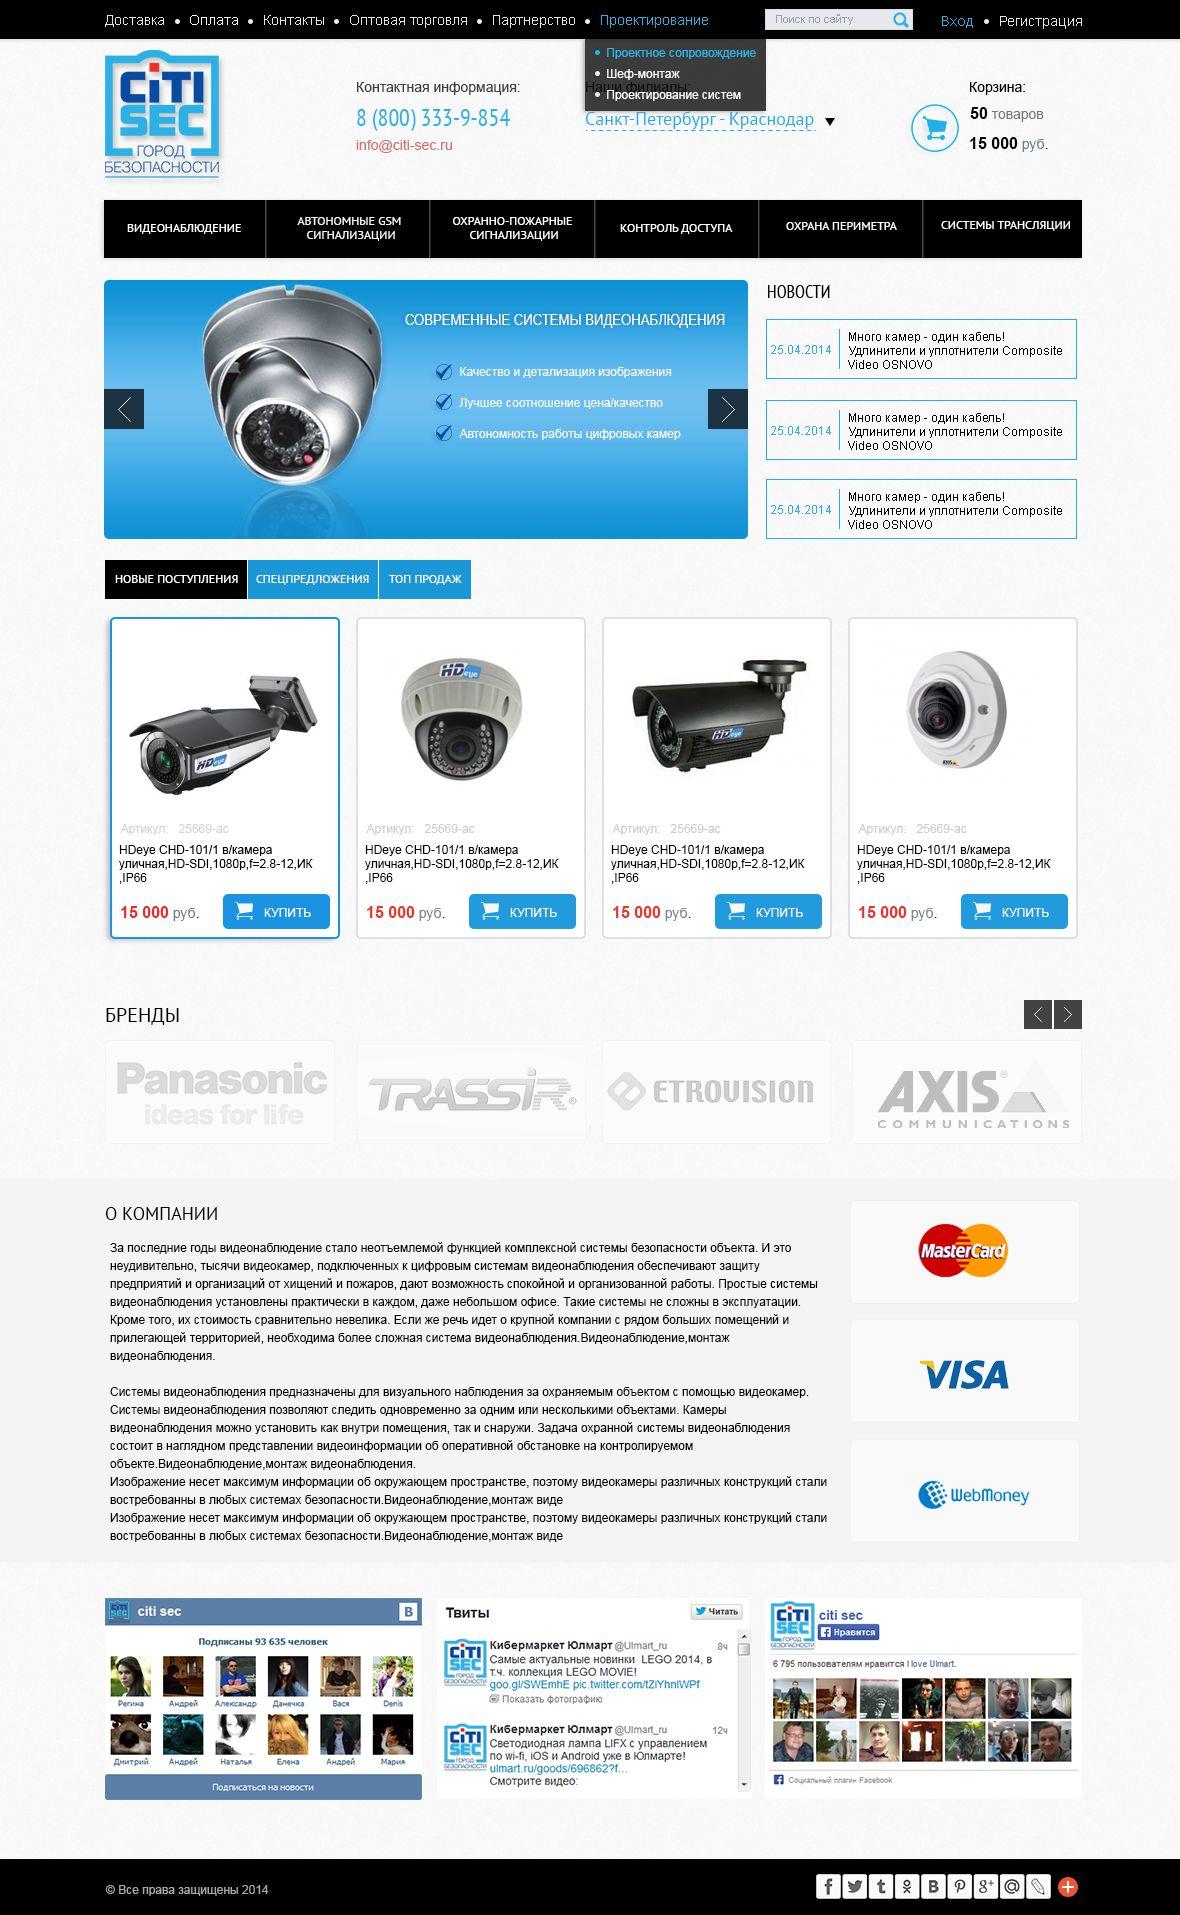 Дизайн интернет-магазина\сайта citi-sec.ru - дизайнер Naysan